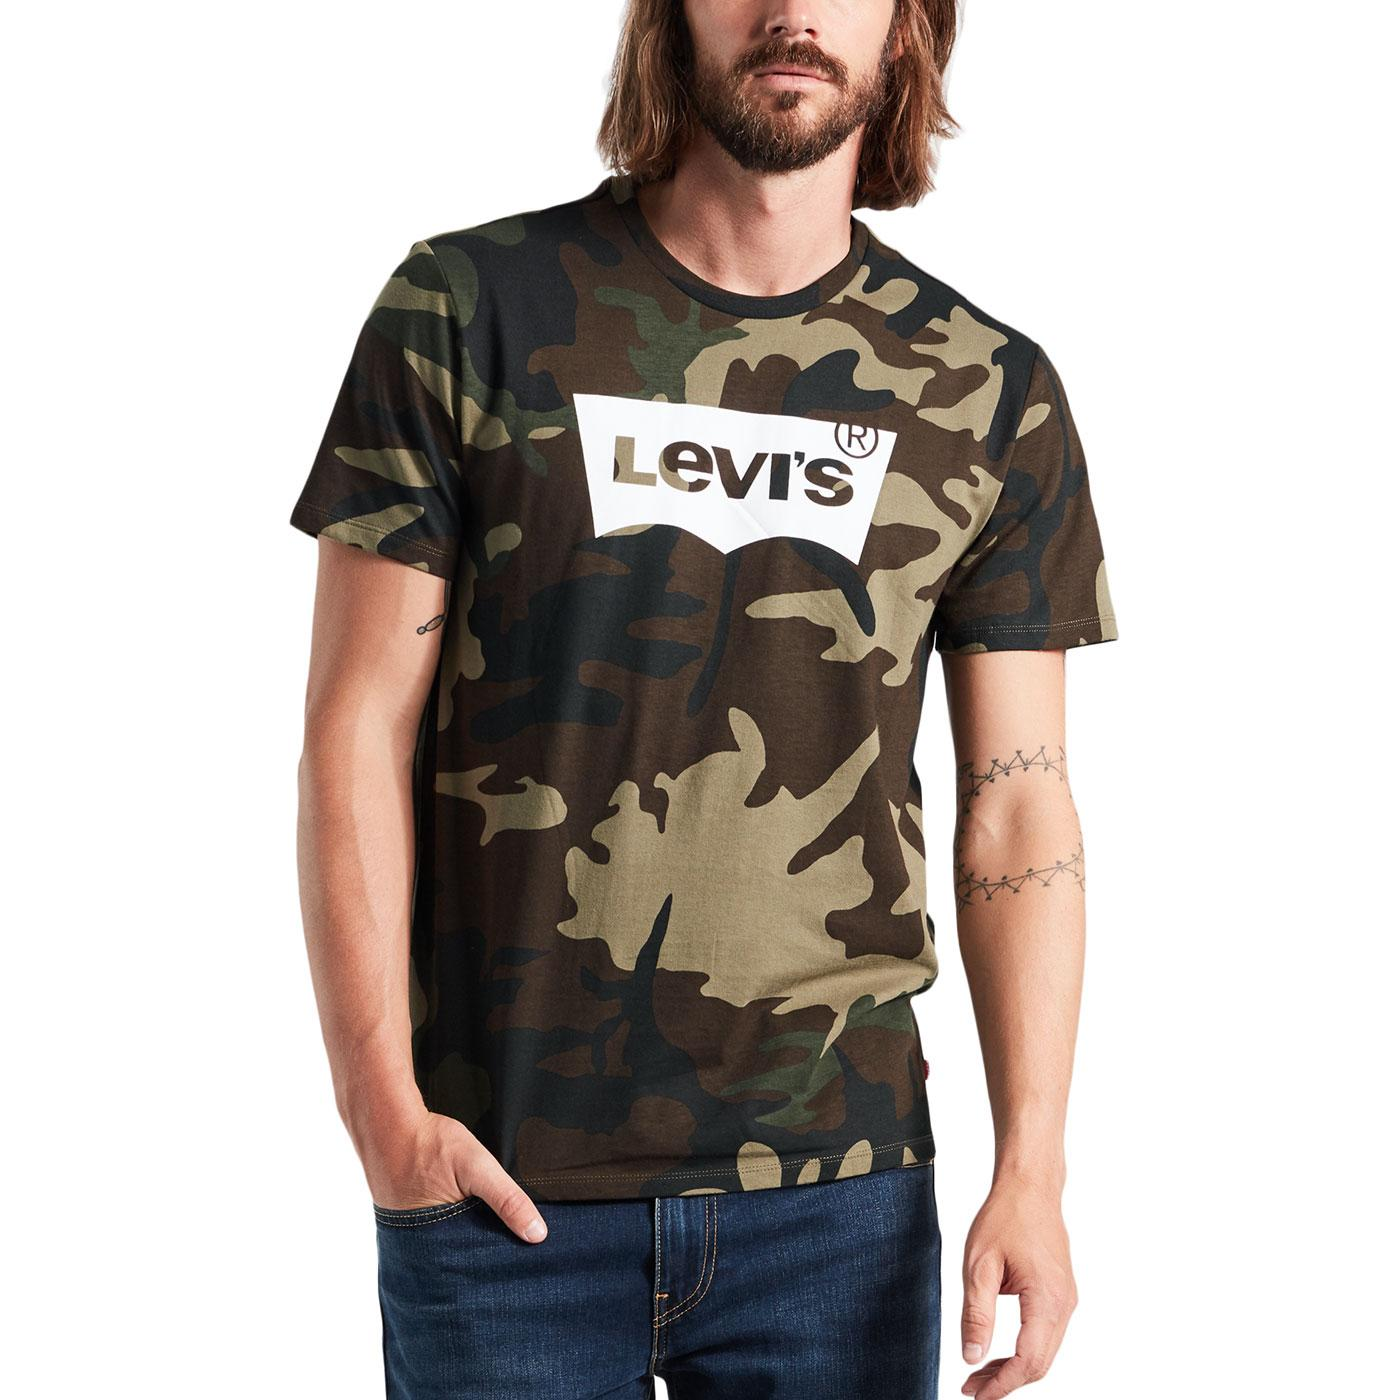 LEVI'S Mens Retro 90s Camo Batwing Logo T-Shirt